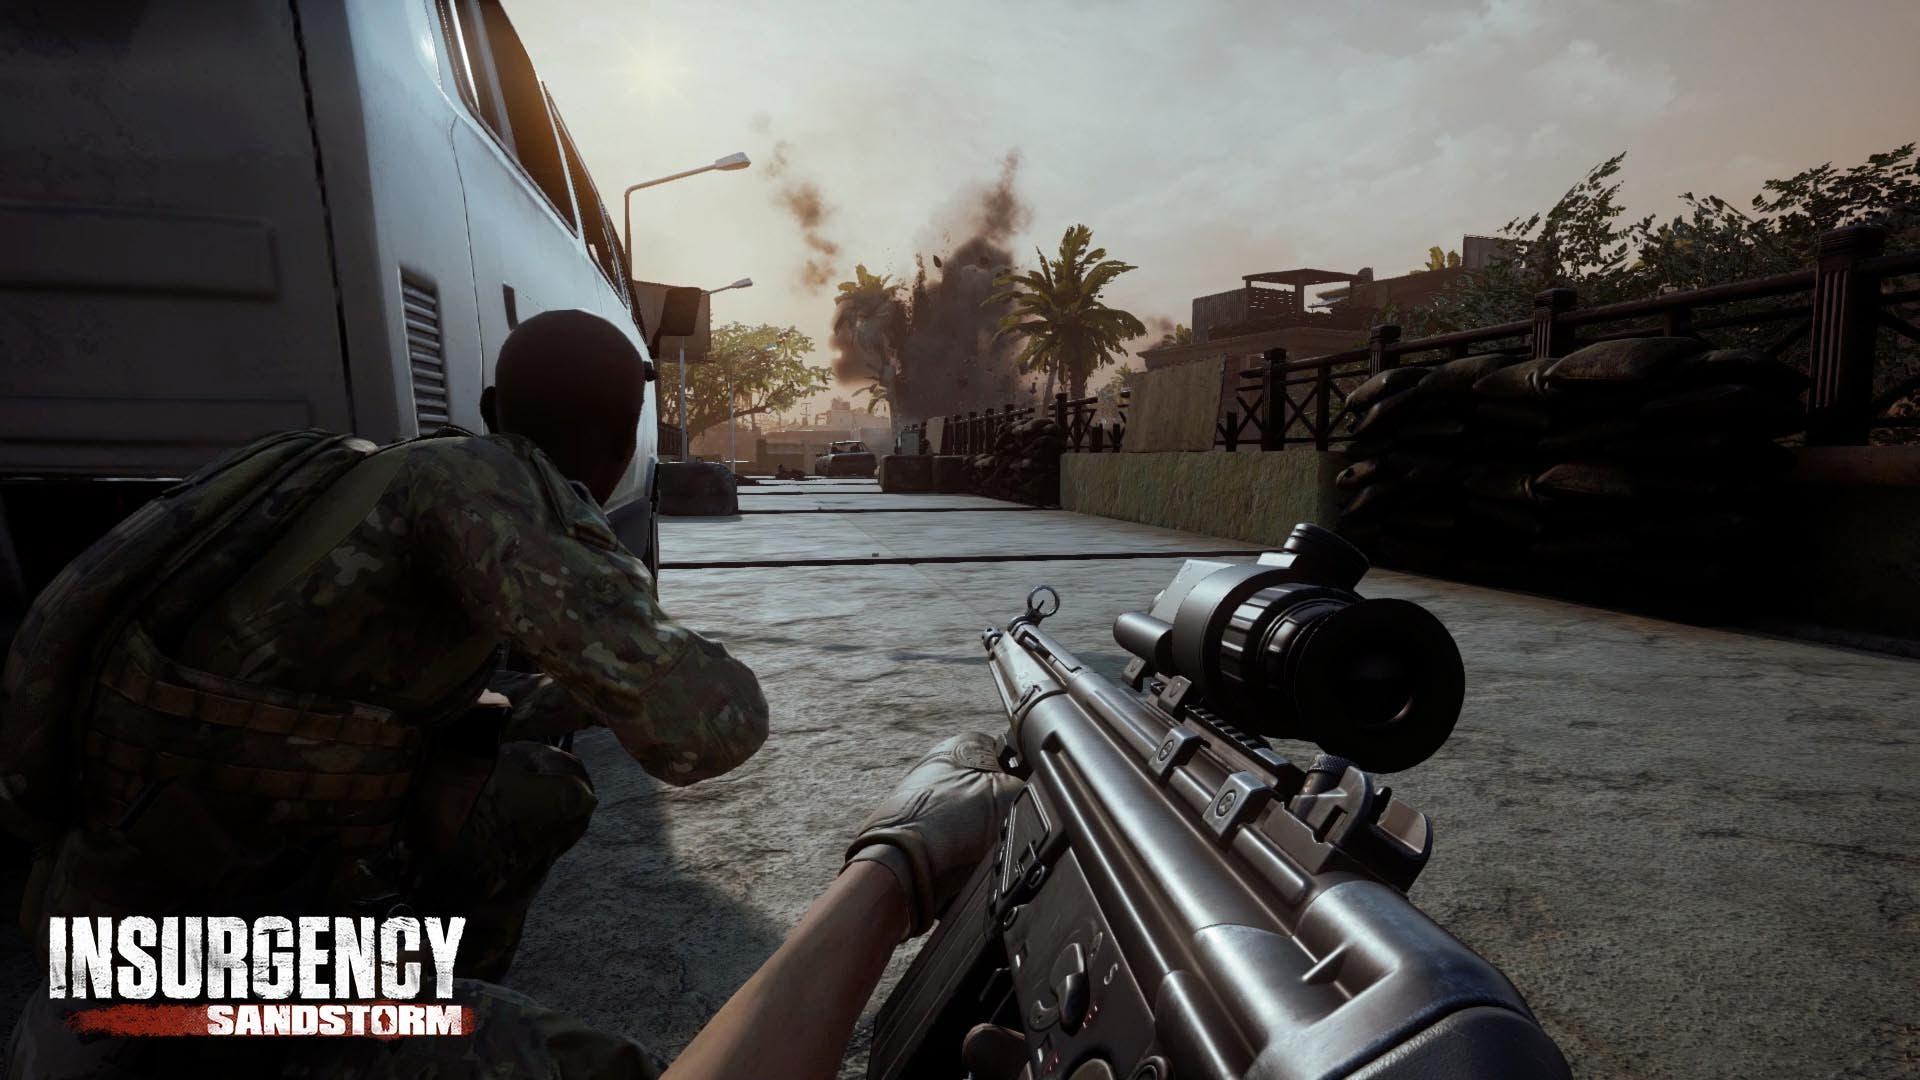 Análisis de Insurgency: Sandstorm - Xbox Series X 5